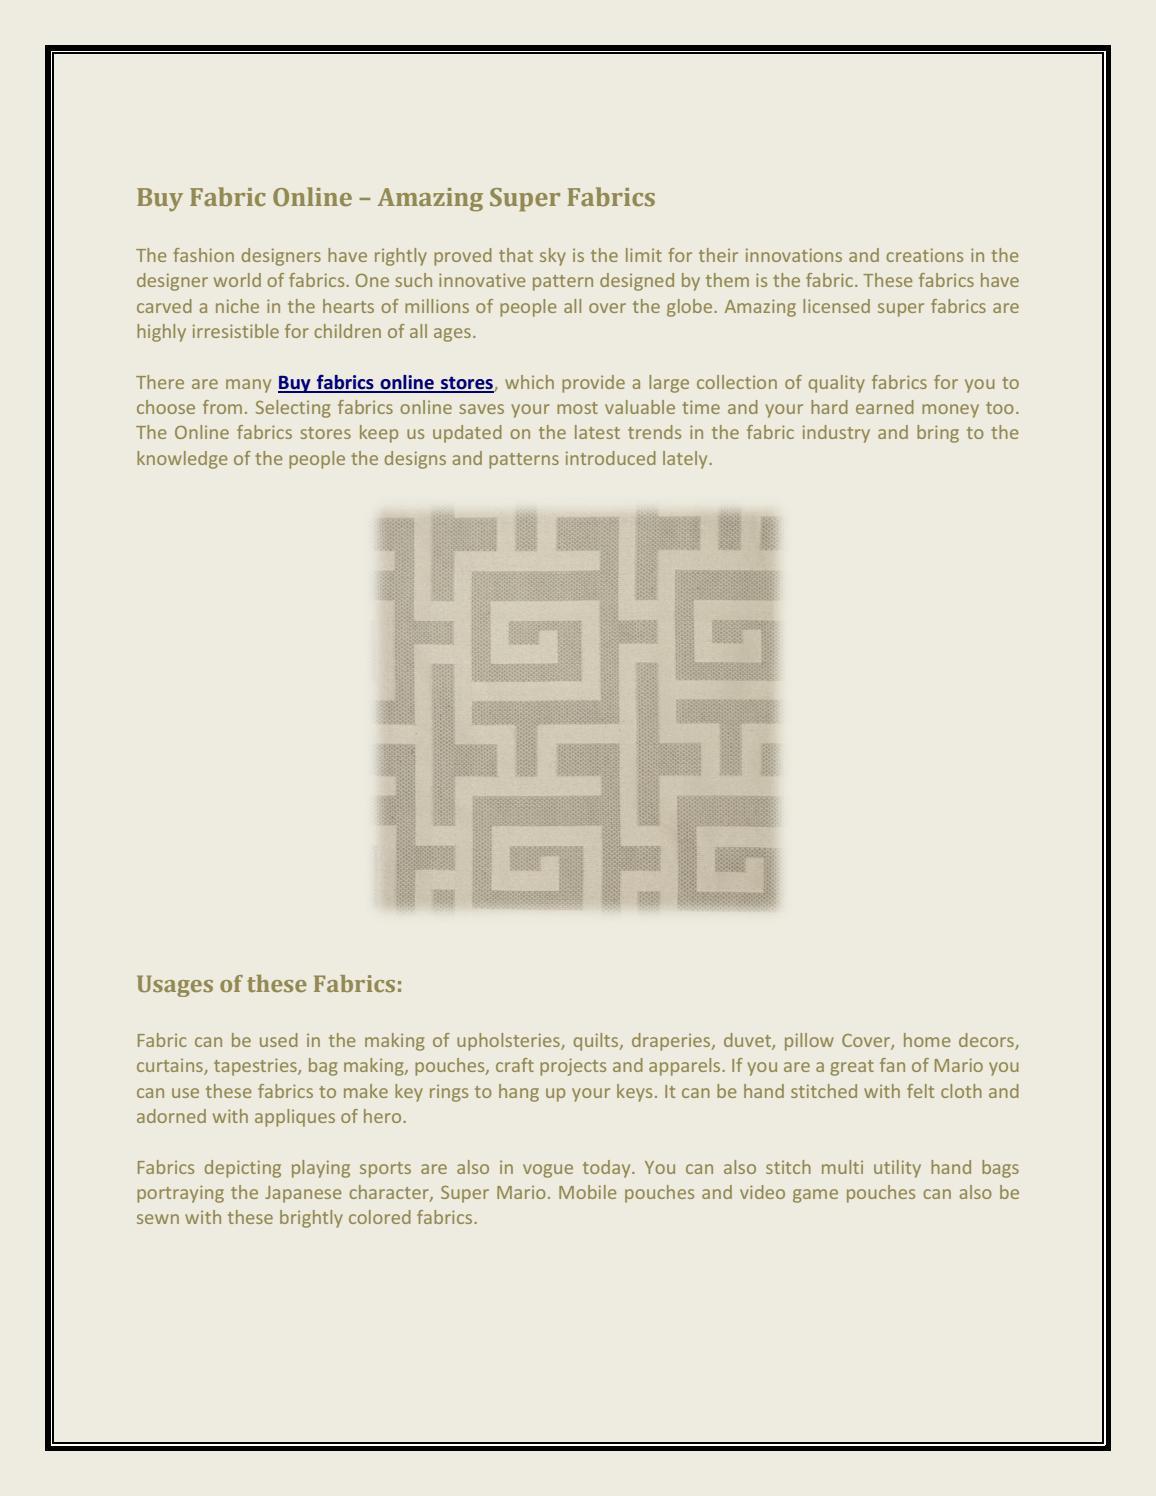 Buy Fabric Online – Amazing Super Fabrics by indigo2fabrics